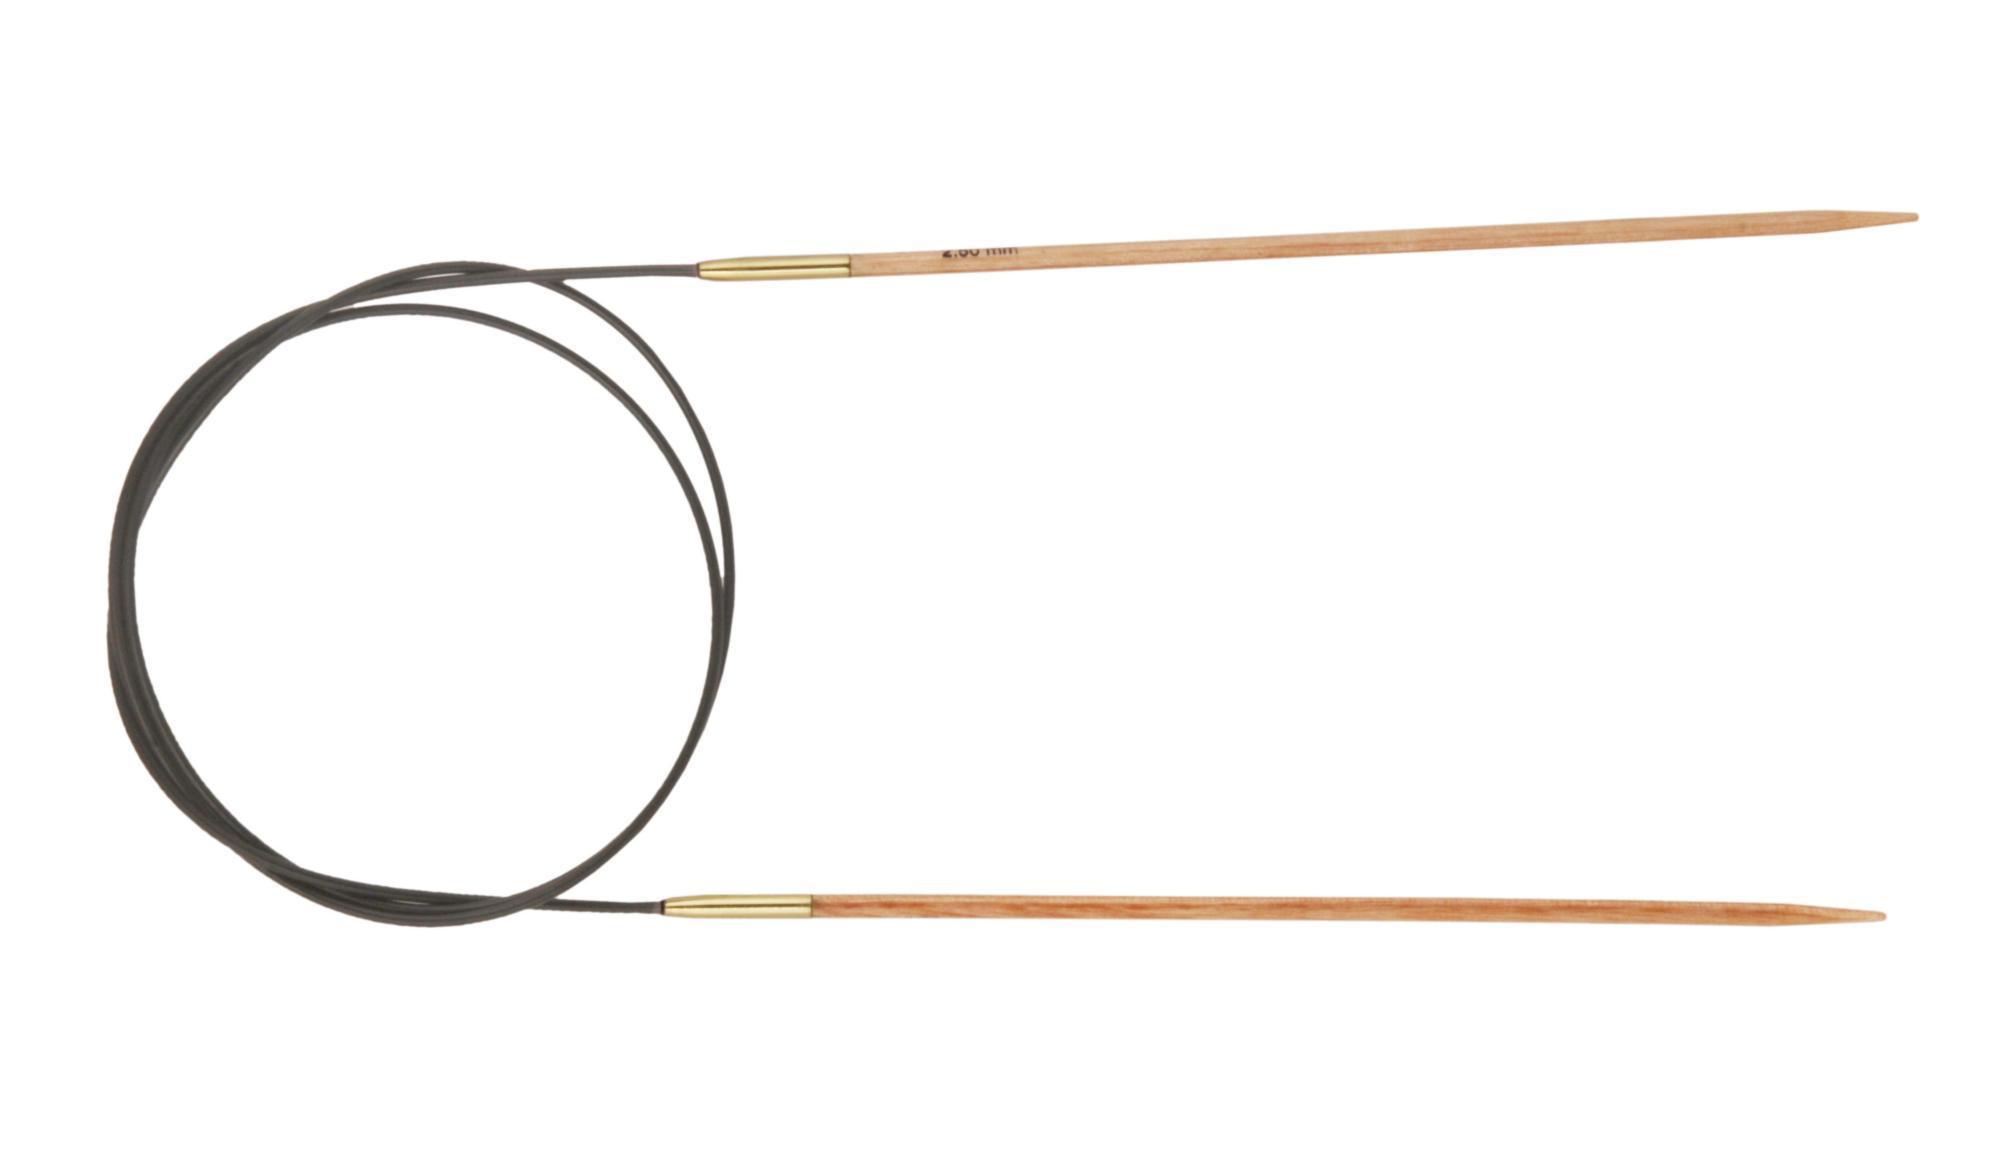 Спицы круговые 100 см Basix Birch Wood KnitPro, 35612, 2.25 мм